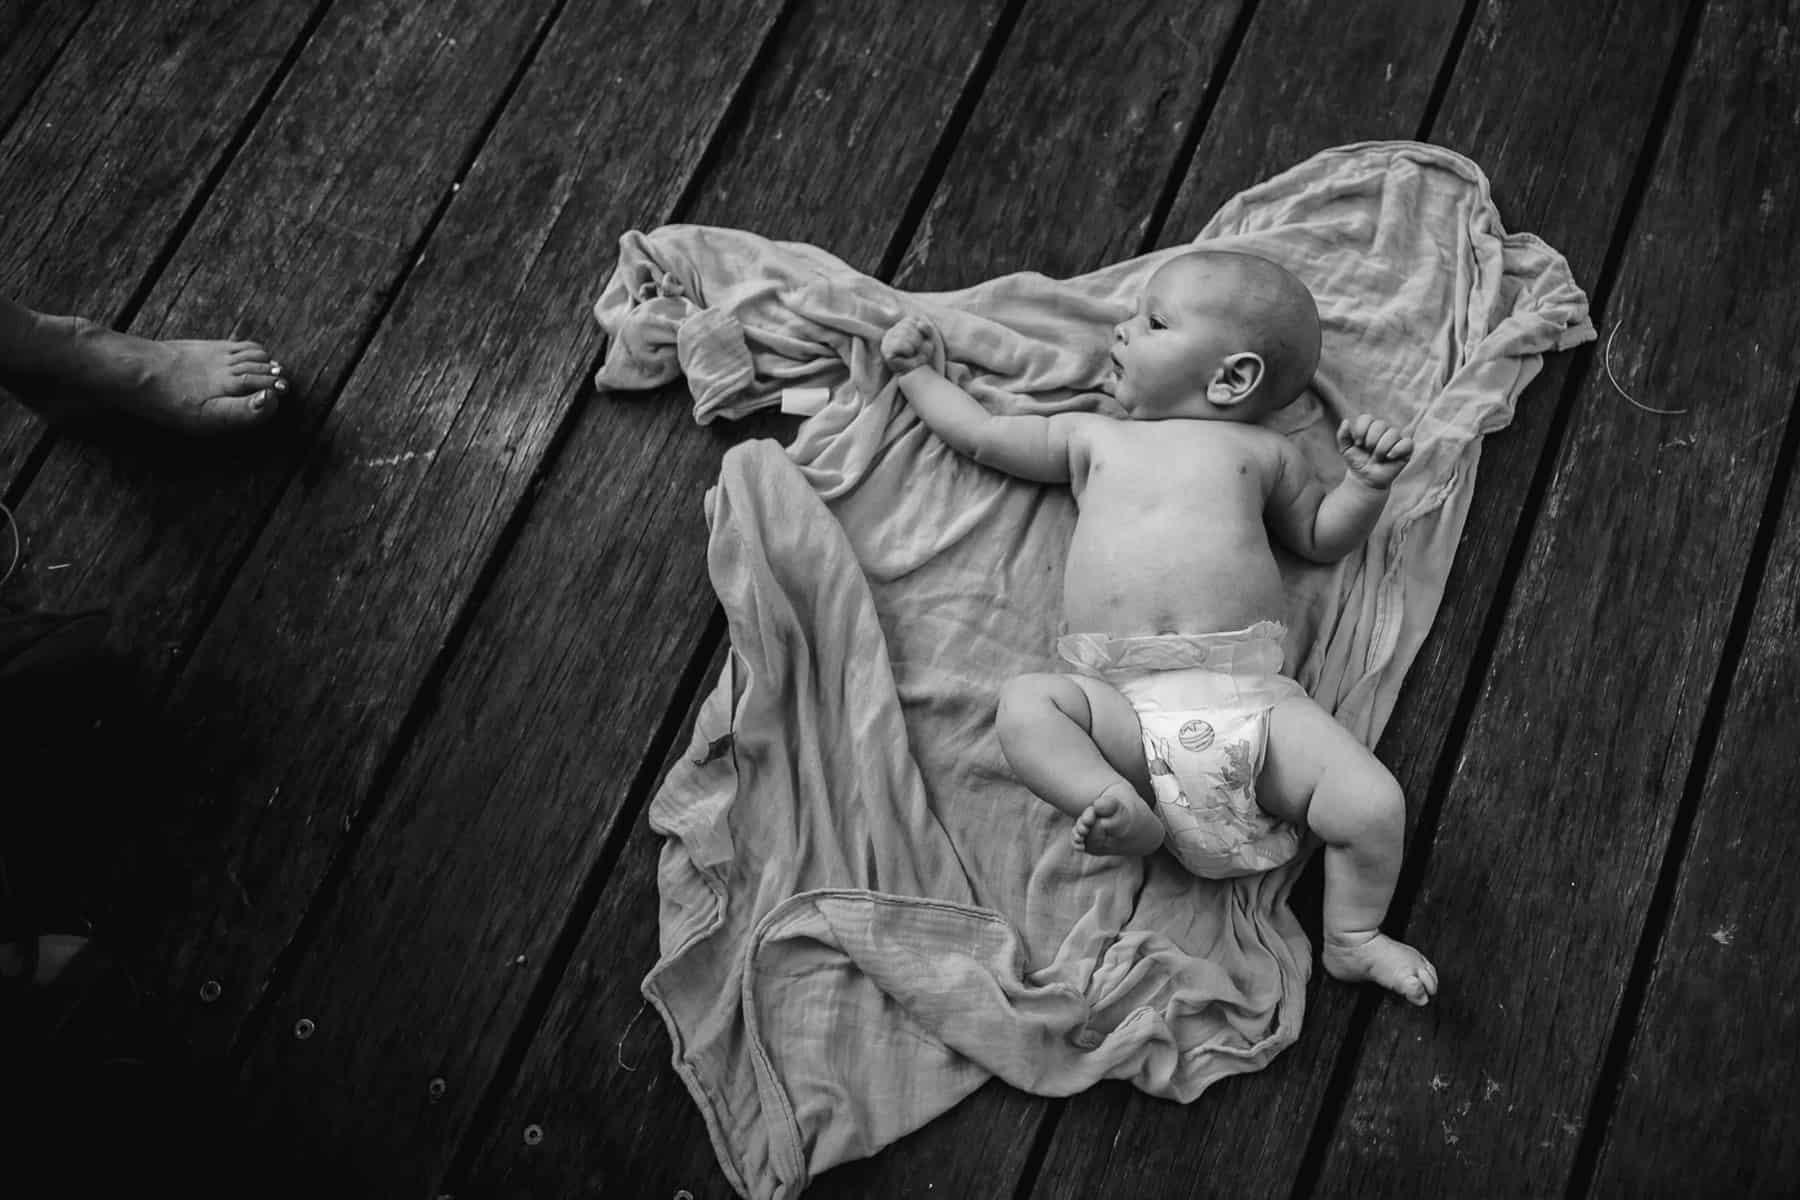 fine art baby photography by Oli Sansom